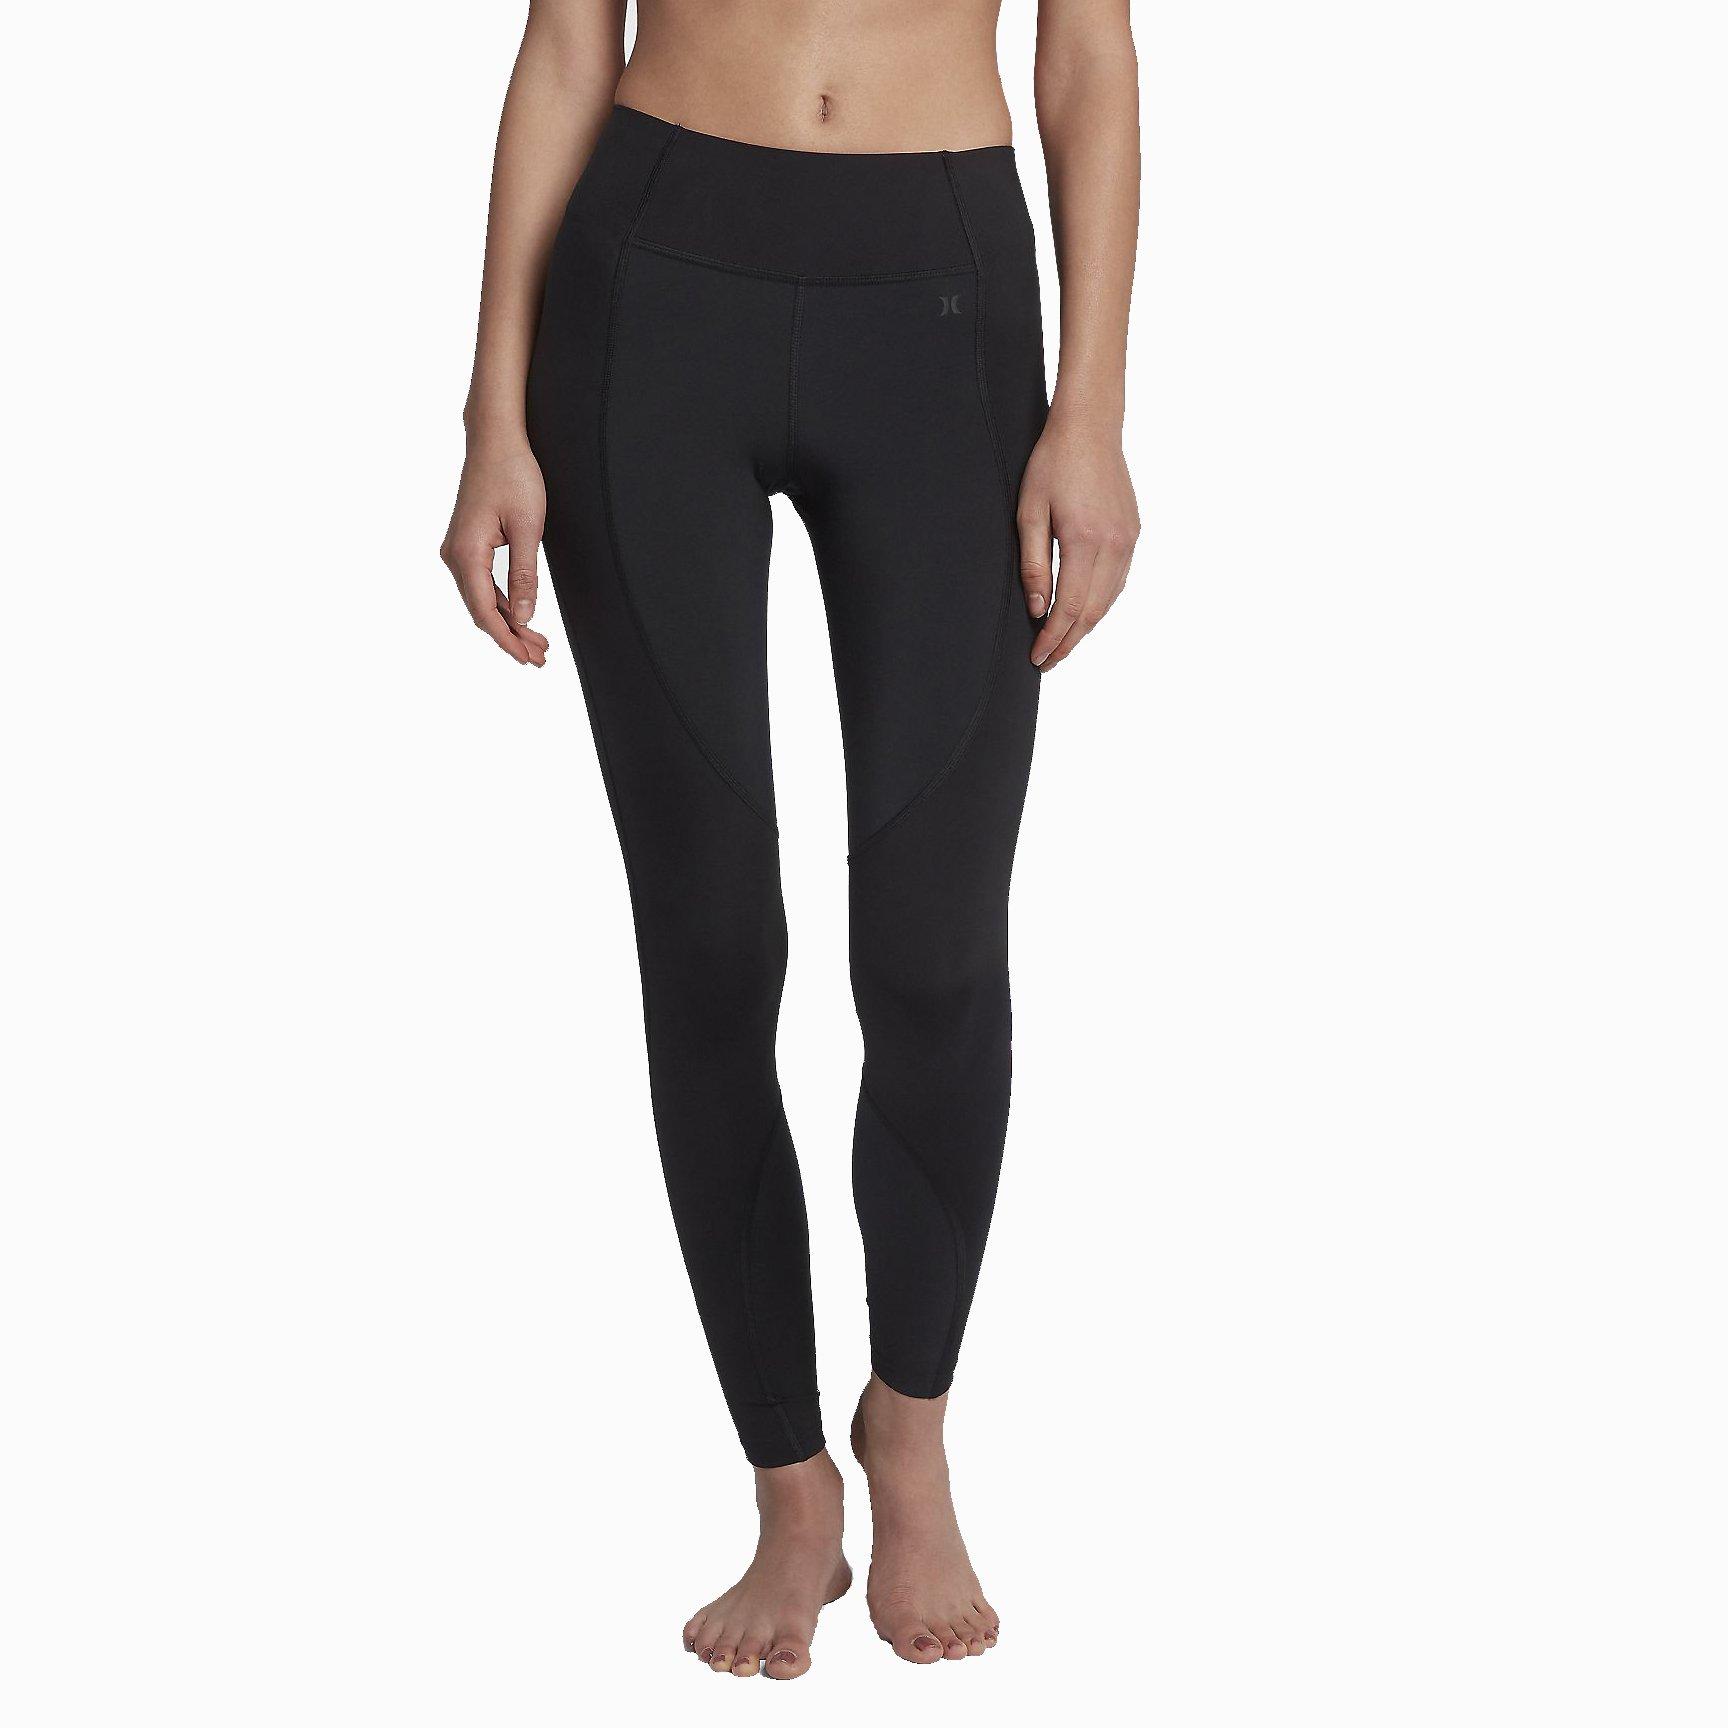 Hurley 940924 Women's Max Leggings, Black - M